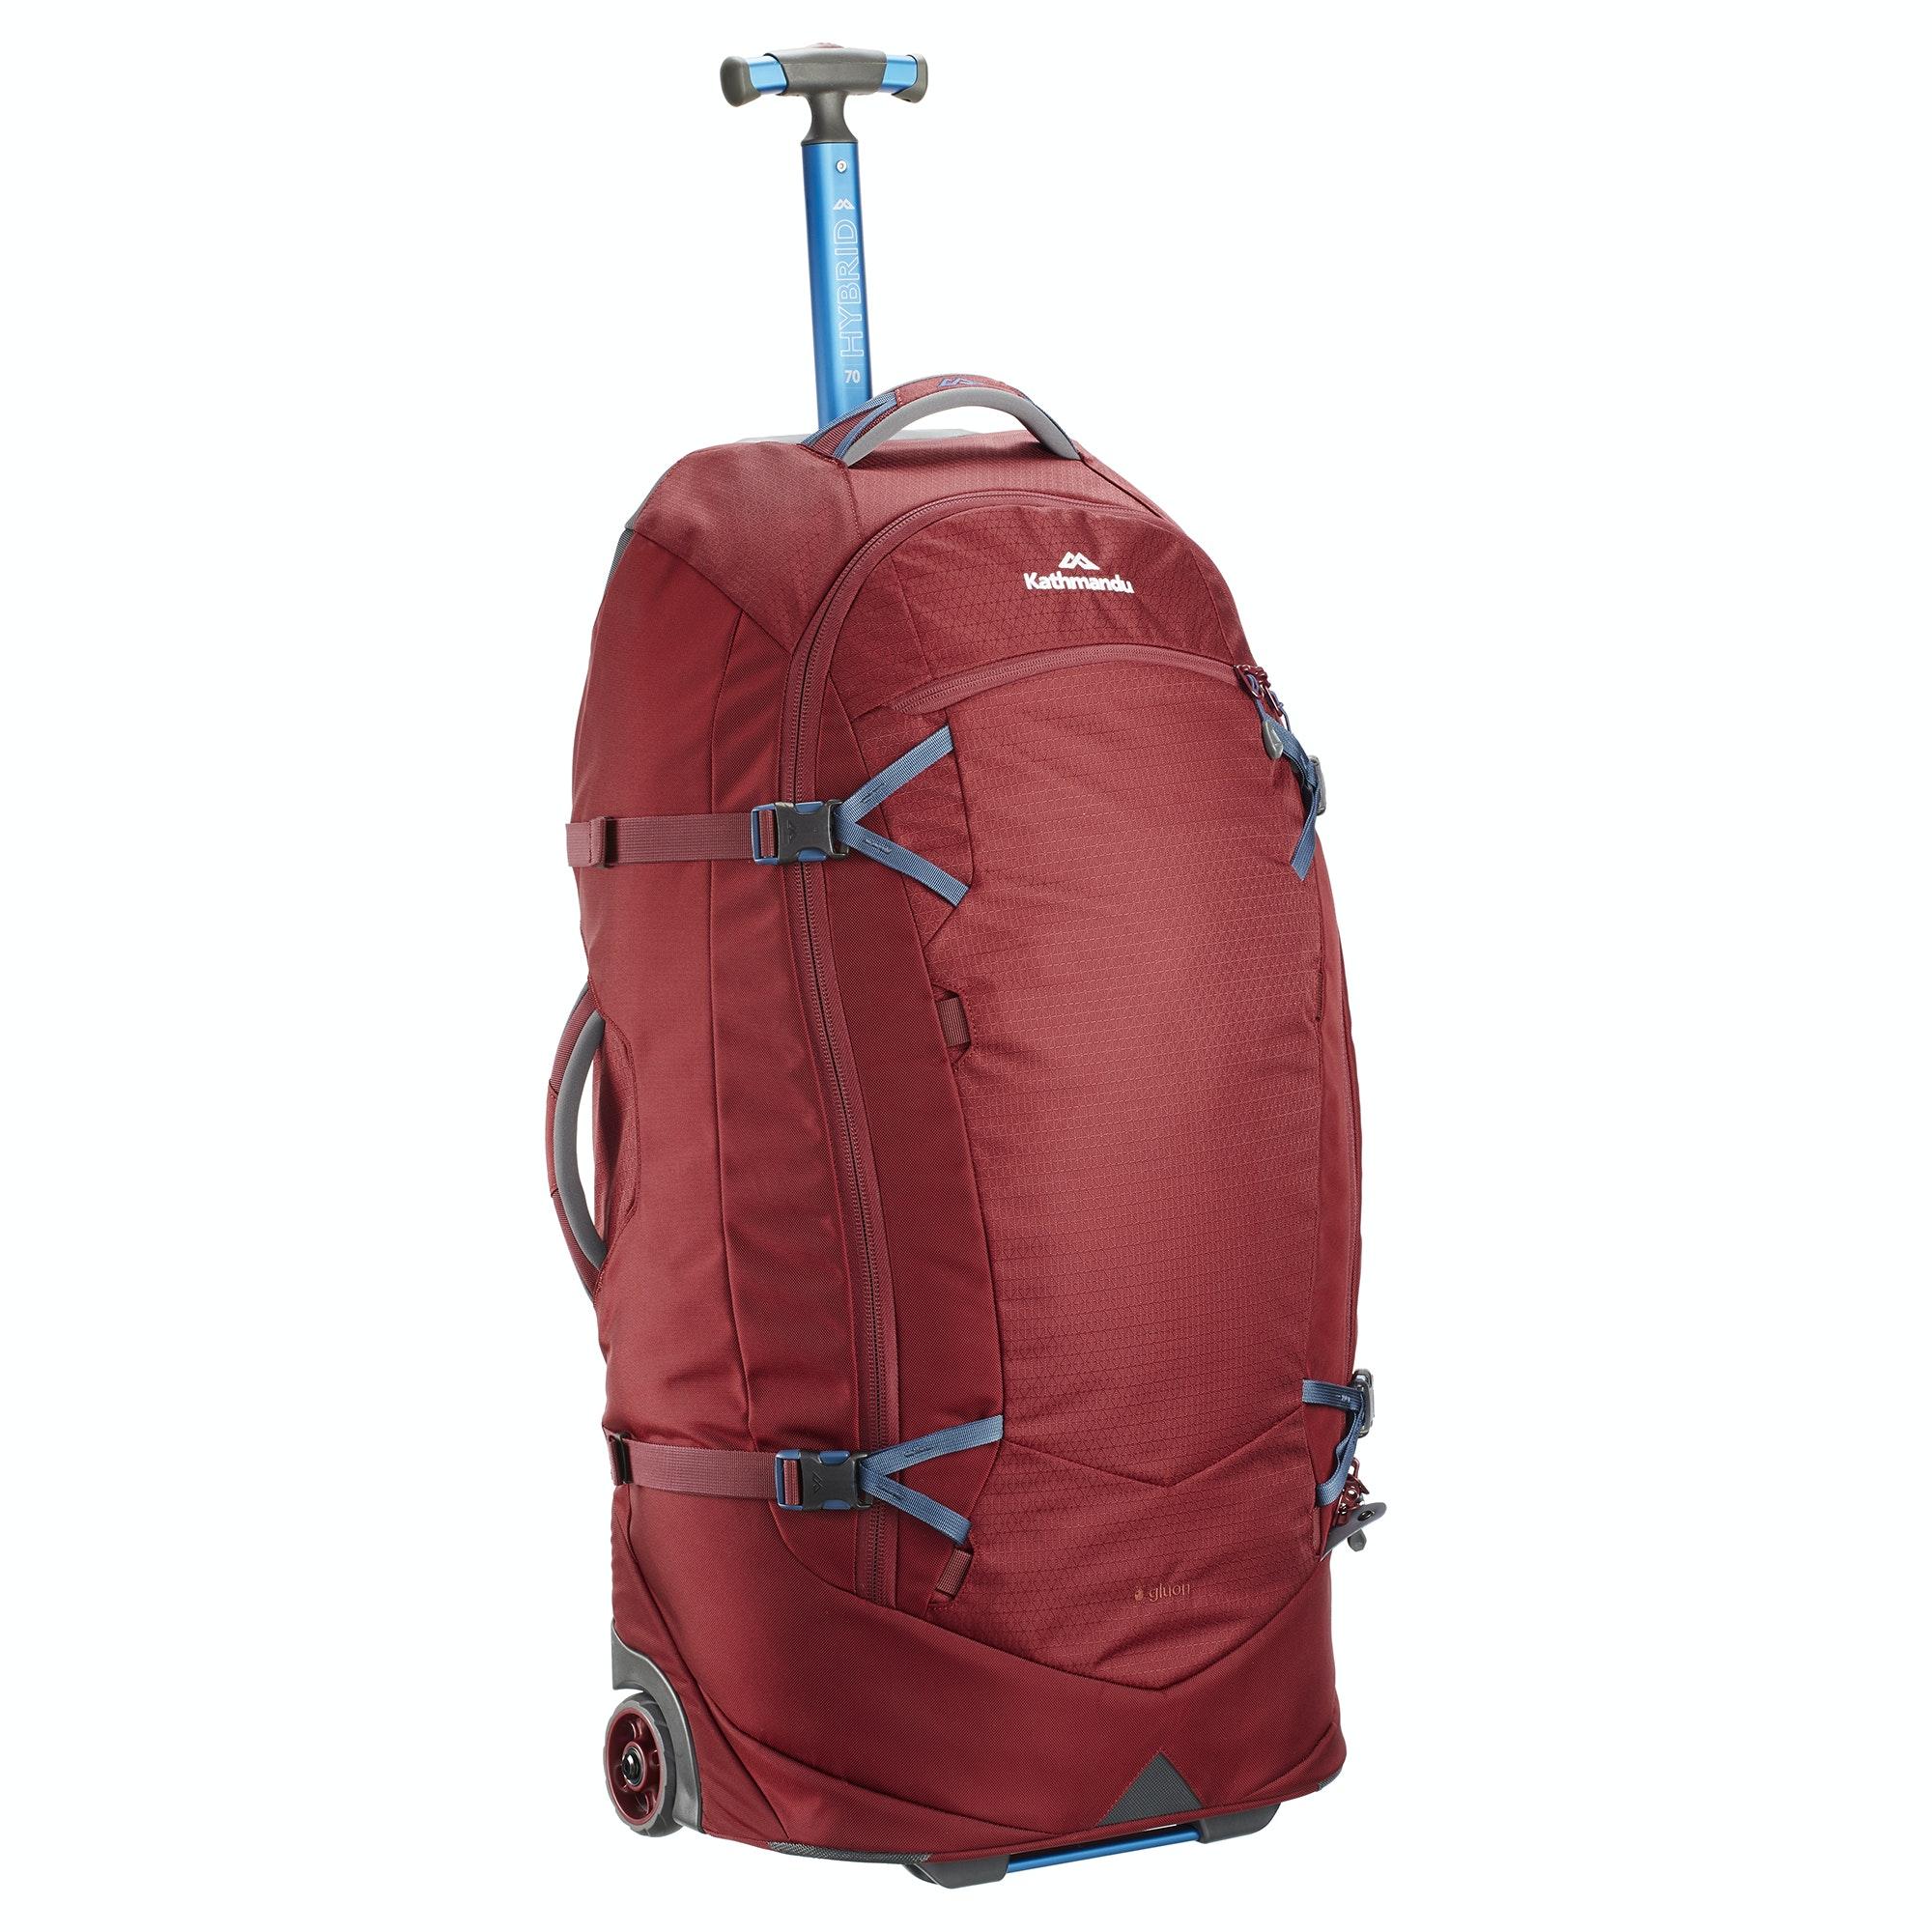 thumbnail 32 - NEW-Kathmandu-Hybrid-70L-Backpack-Wheeled-Handle-Luggage-Bag-Travel-Trolley